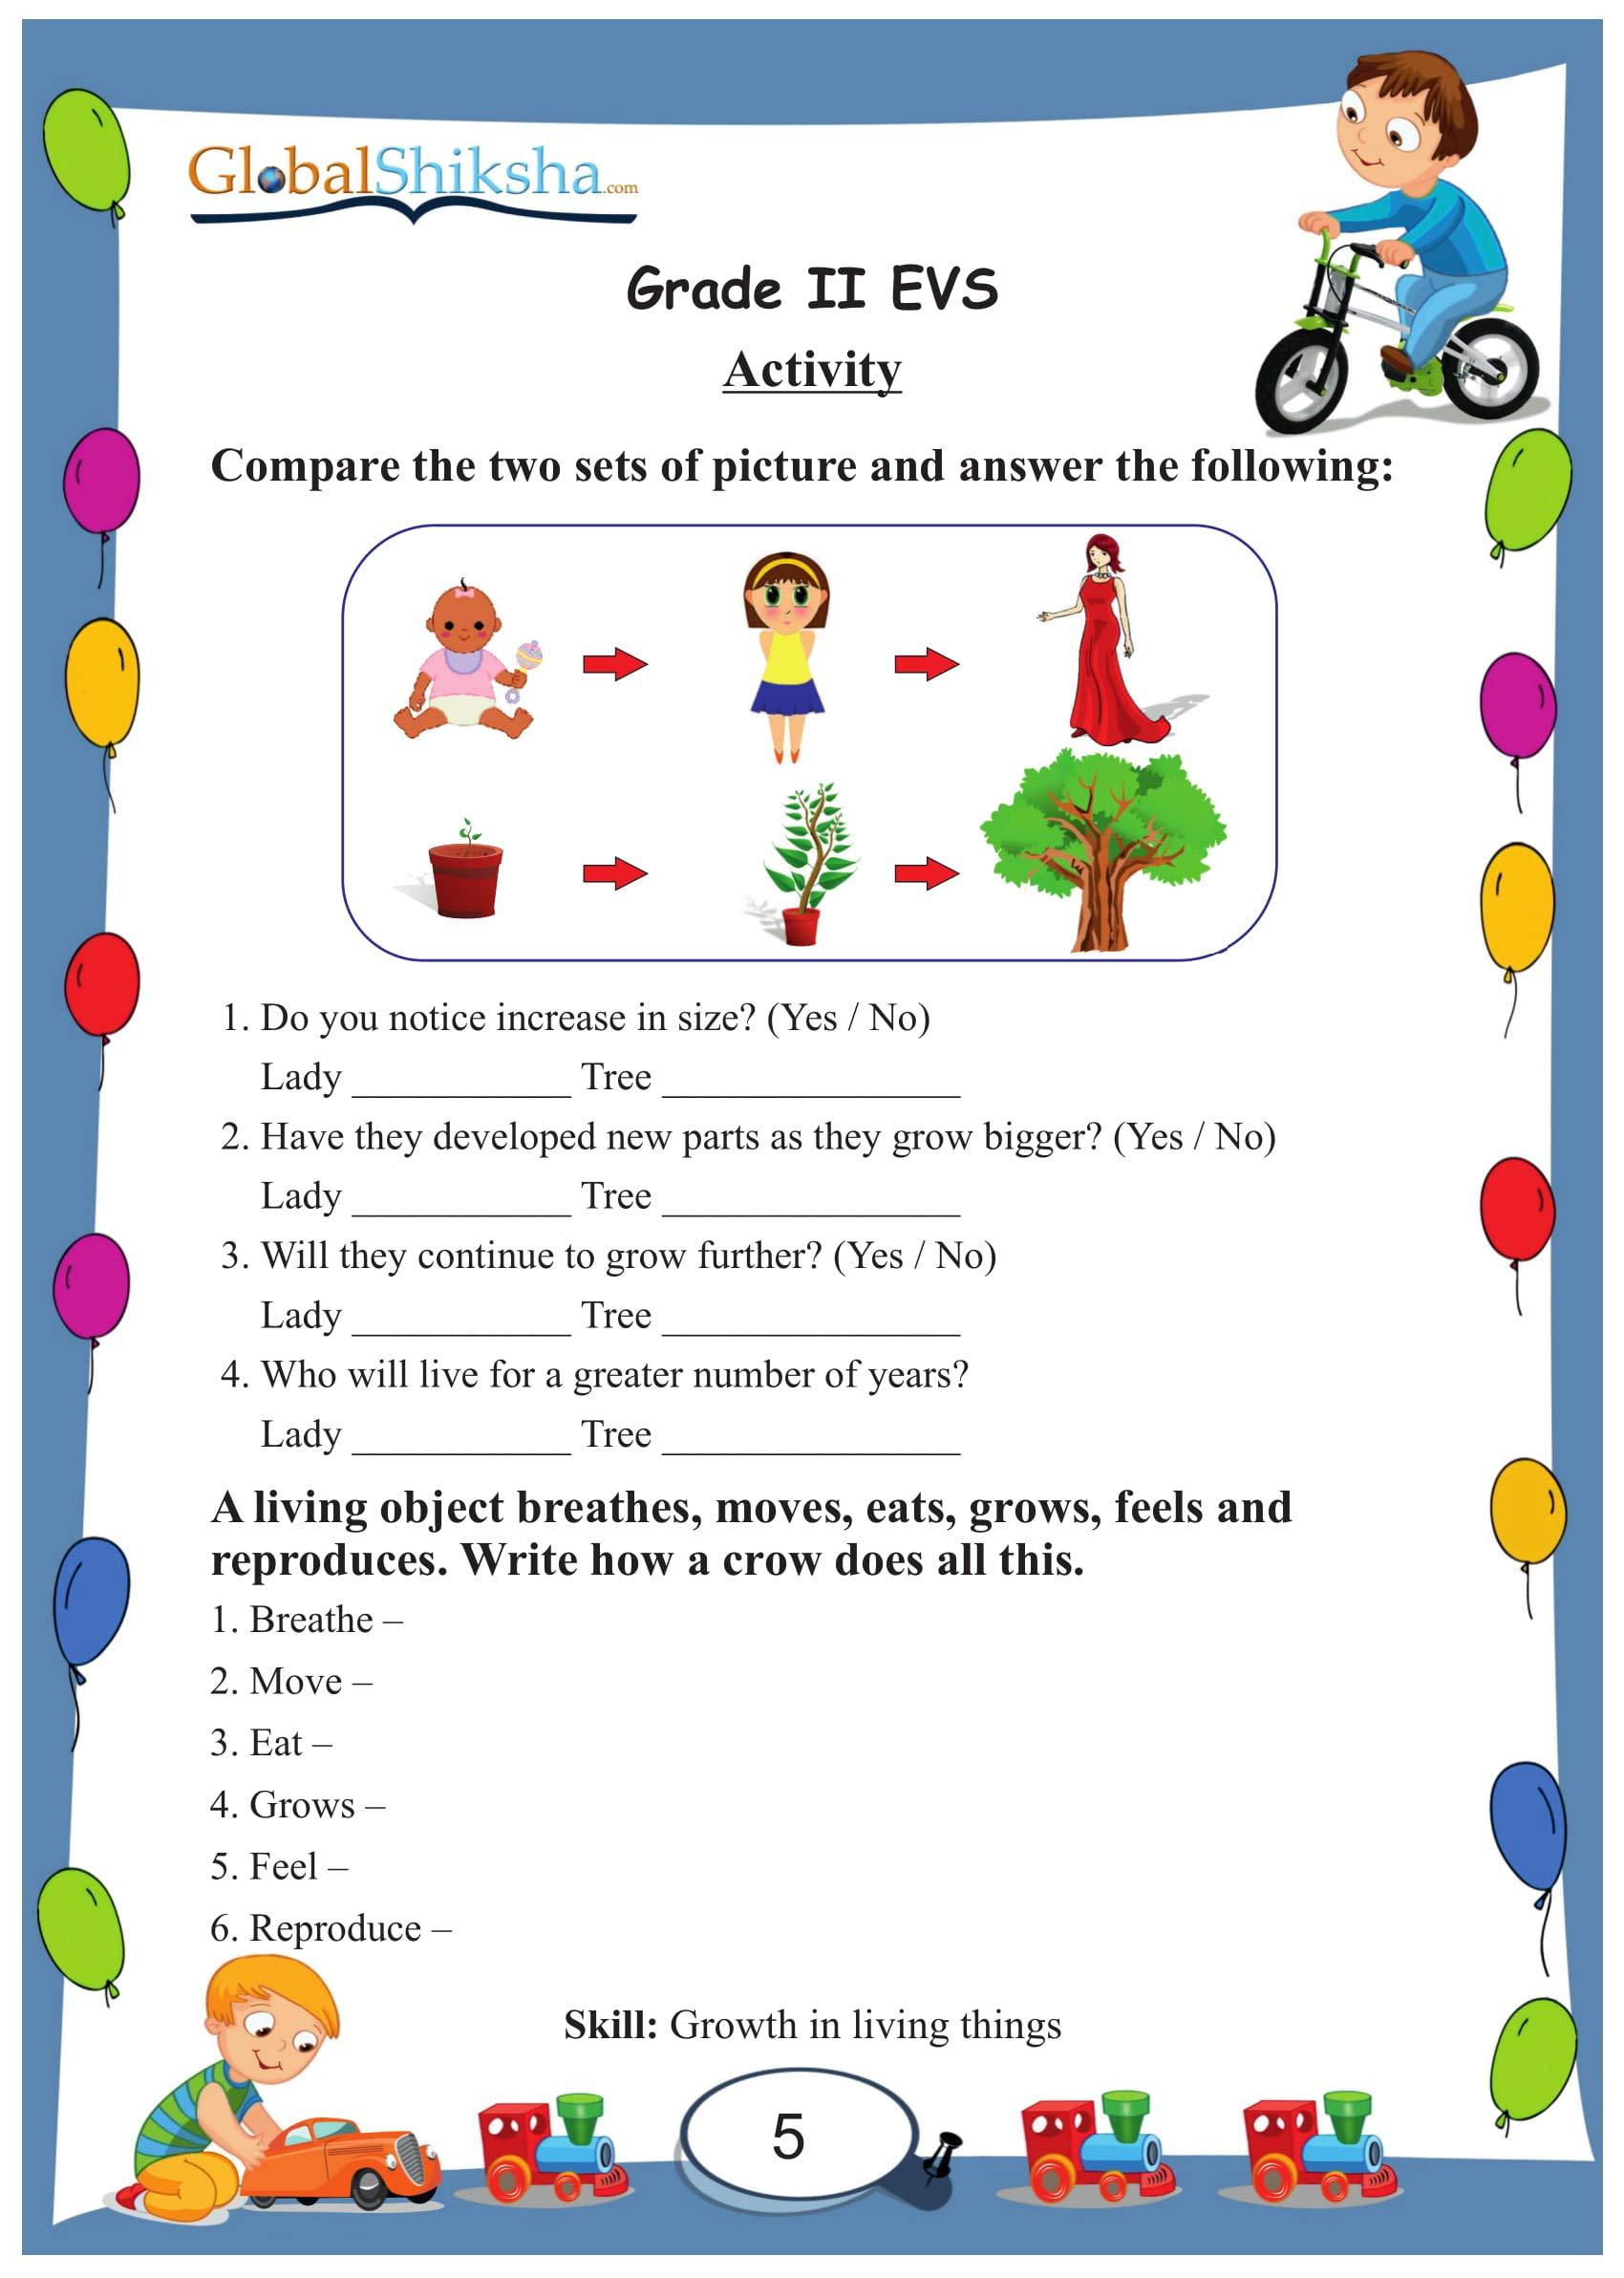 Printables of Grade 2 Evs Worksheets Free - Inspiracao Kids